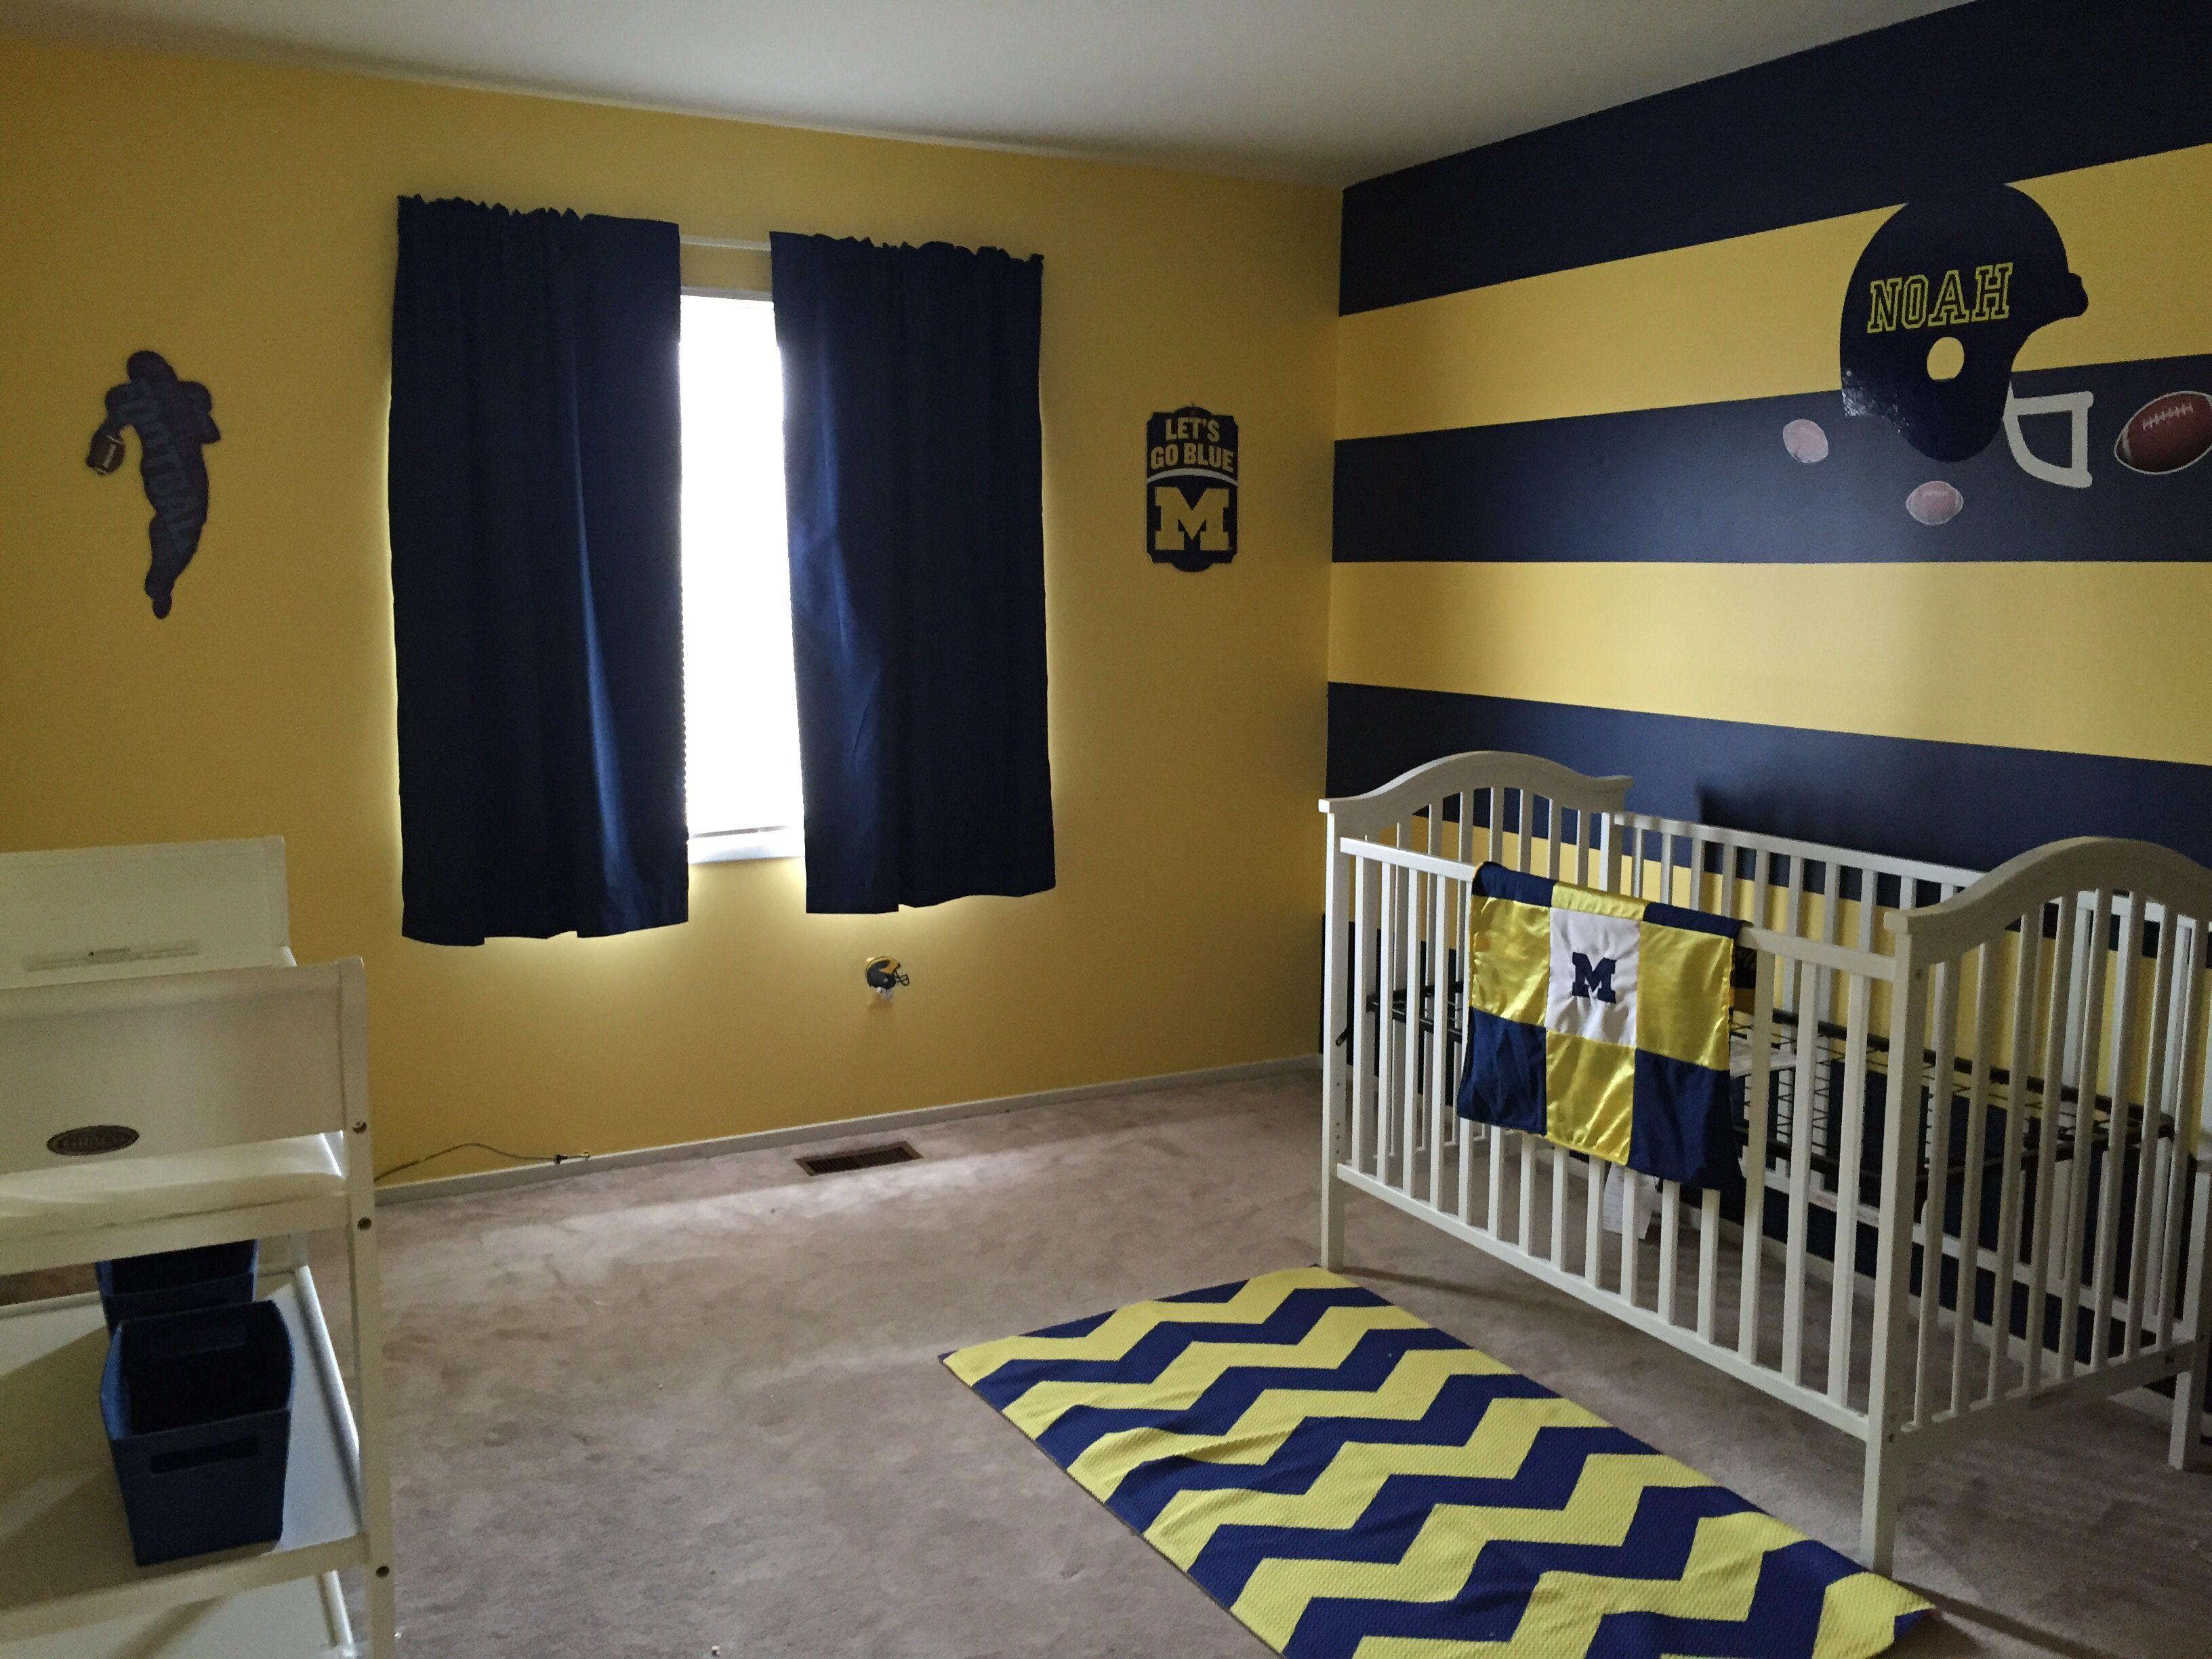 Michigan Wolverines Baby Nursery U Of M Football